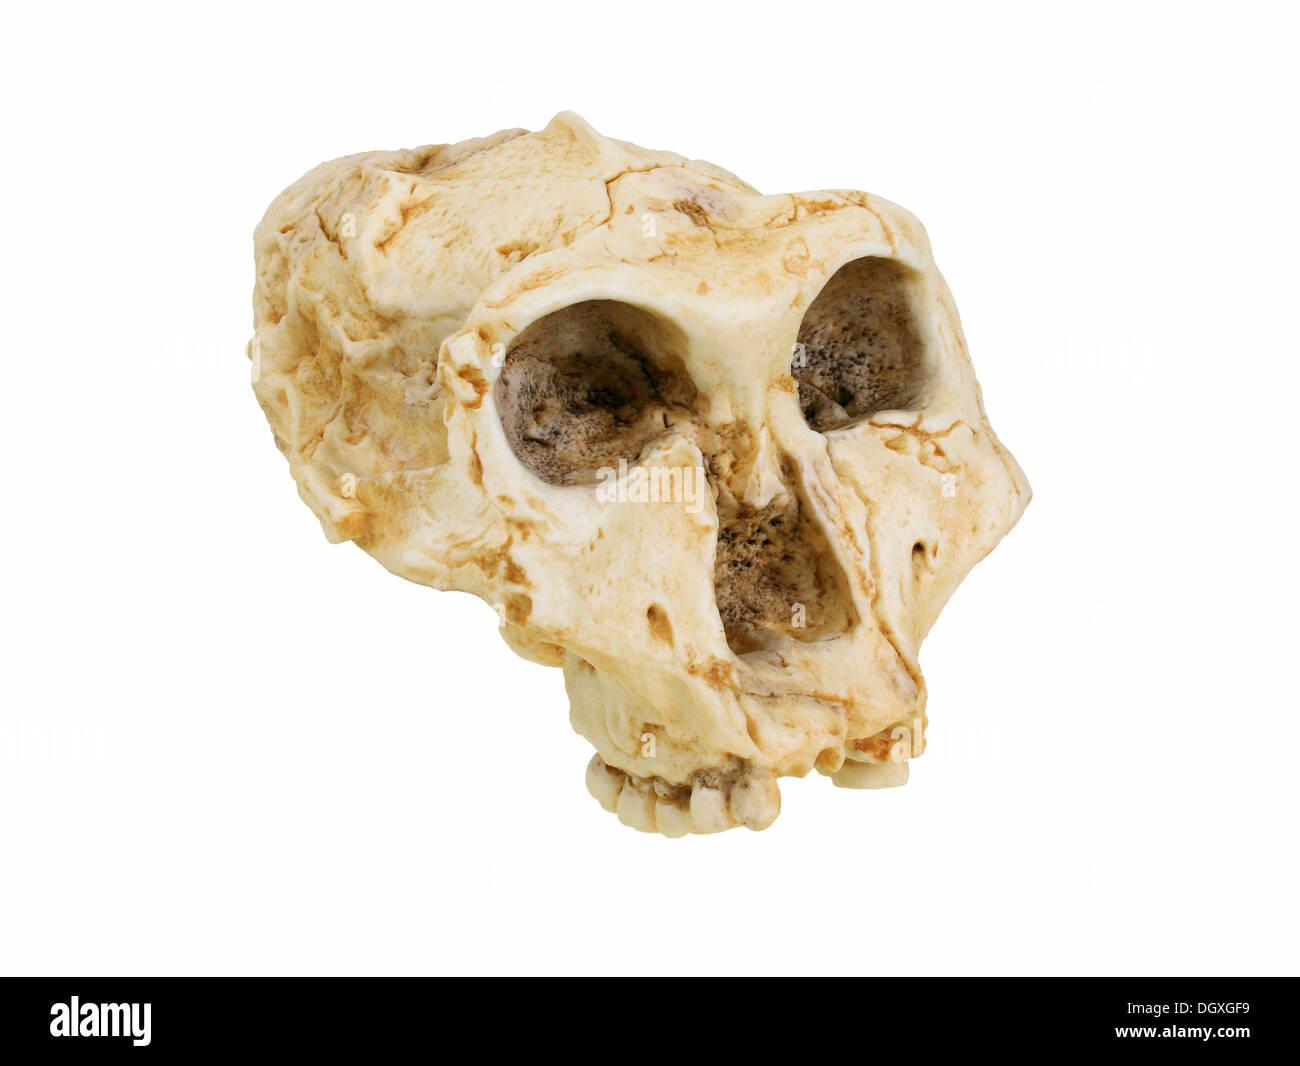 Replica skull of Paranthropus robustus, evolution of human species - Stock Image